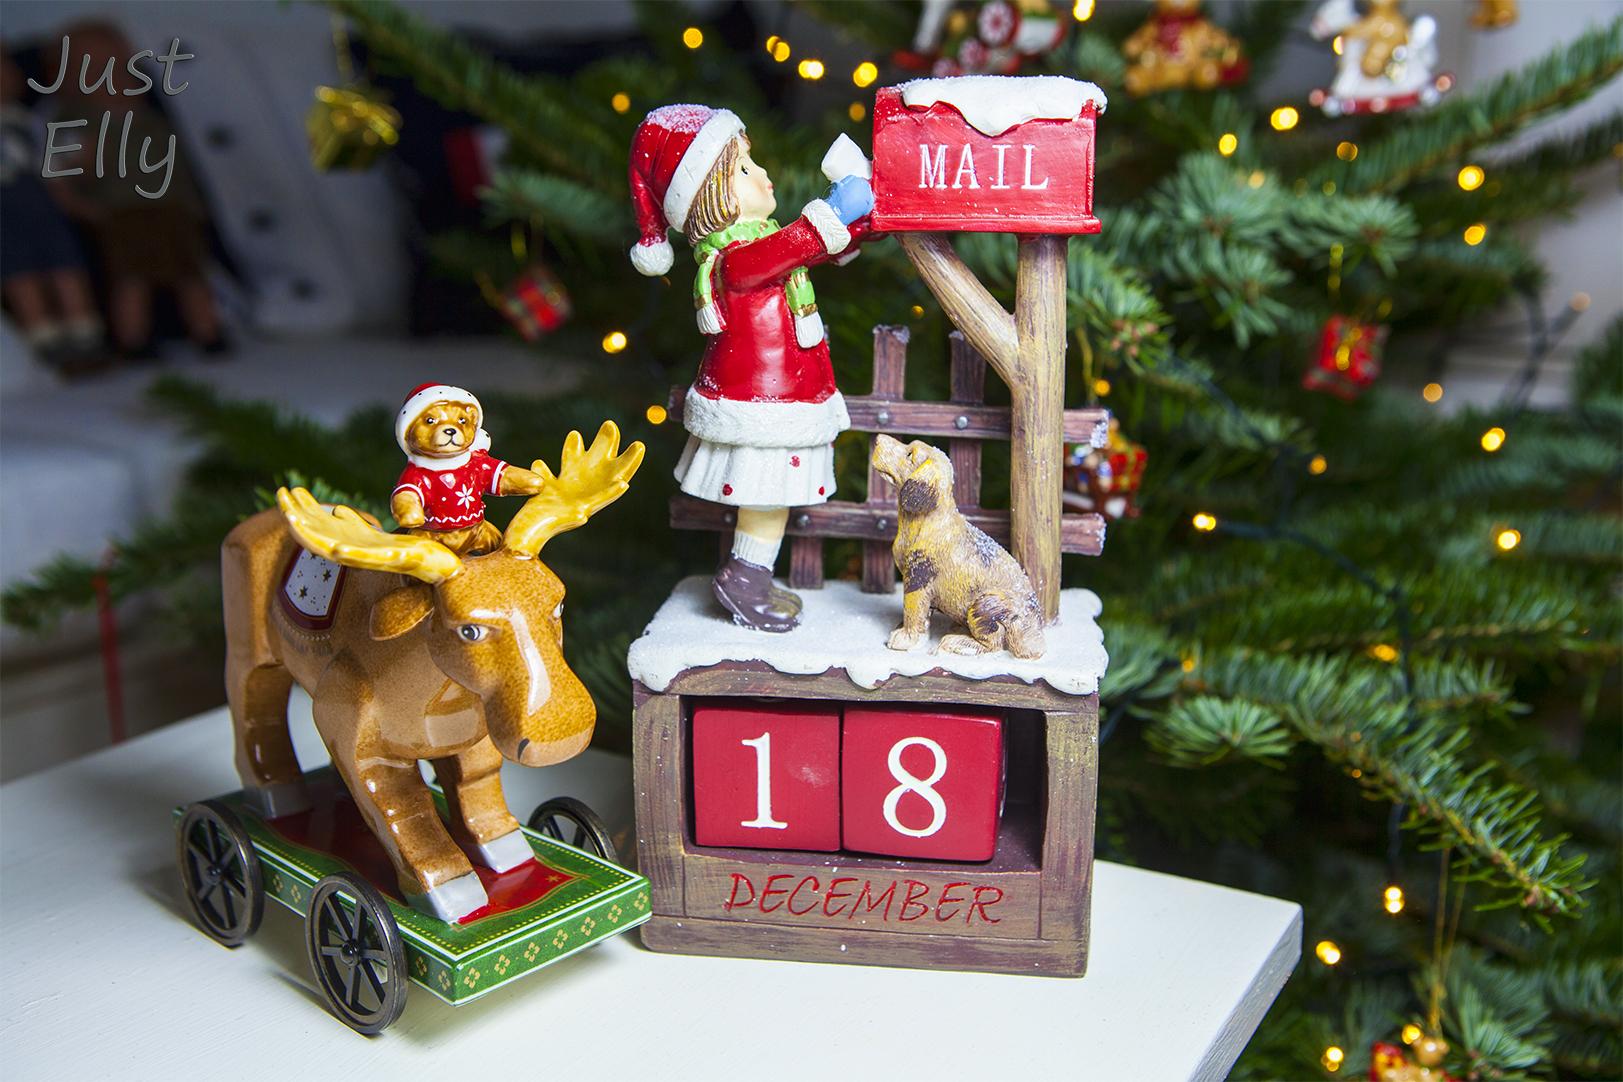 December 18th - My advent calendar